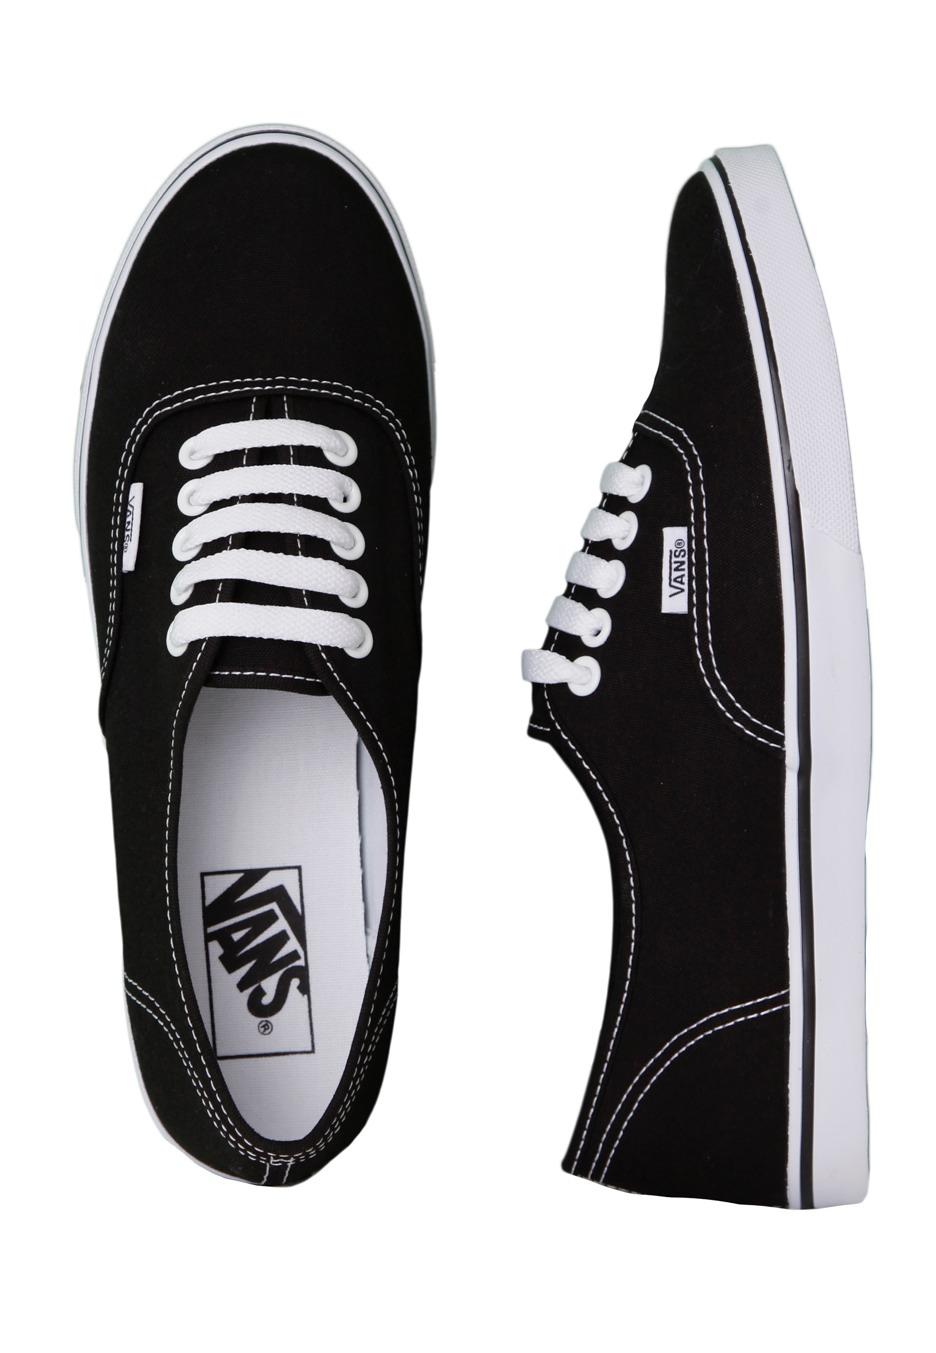 Vans Authentic Lo Pro BlackTrue White Girl Schuhe